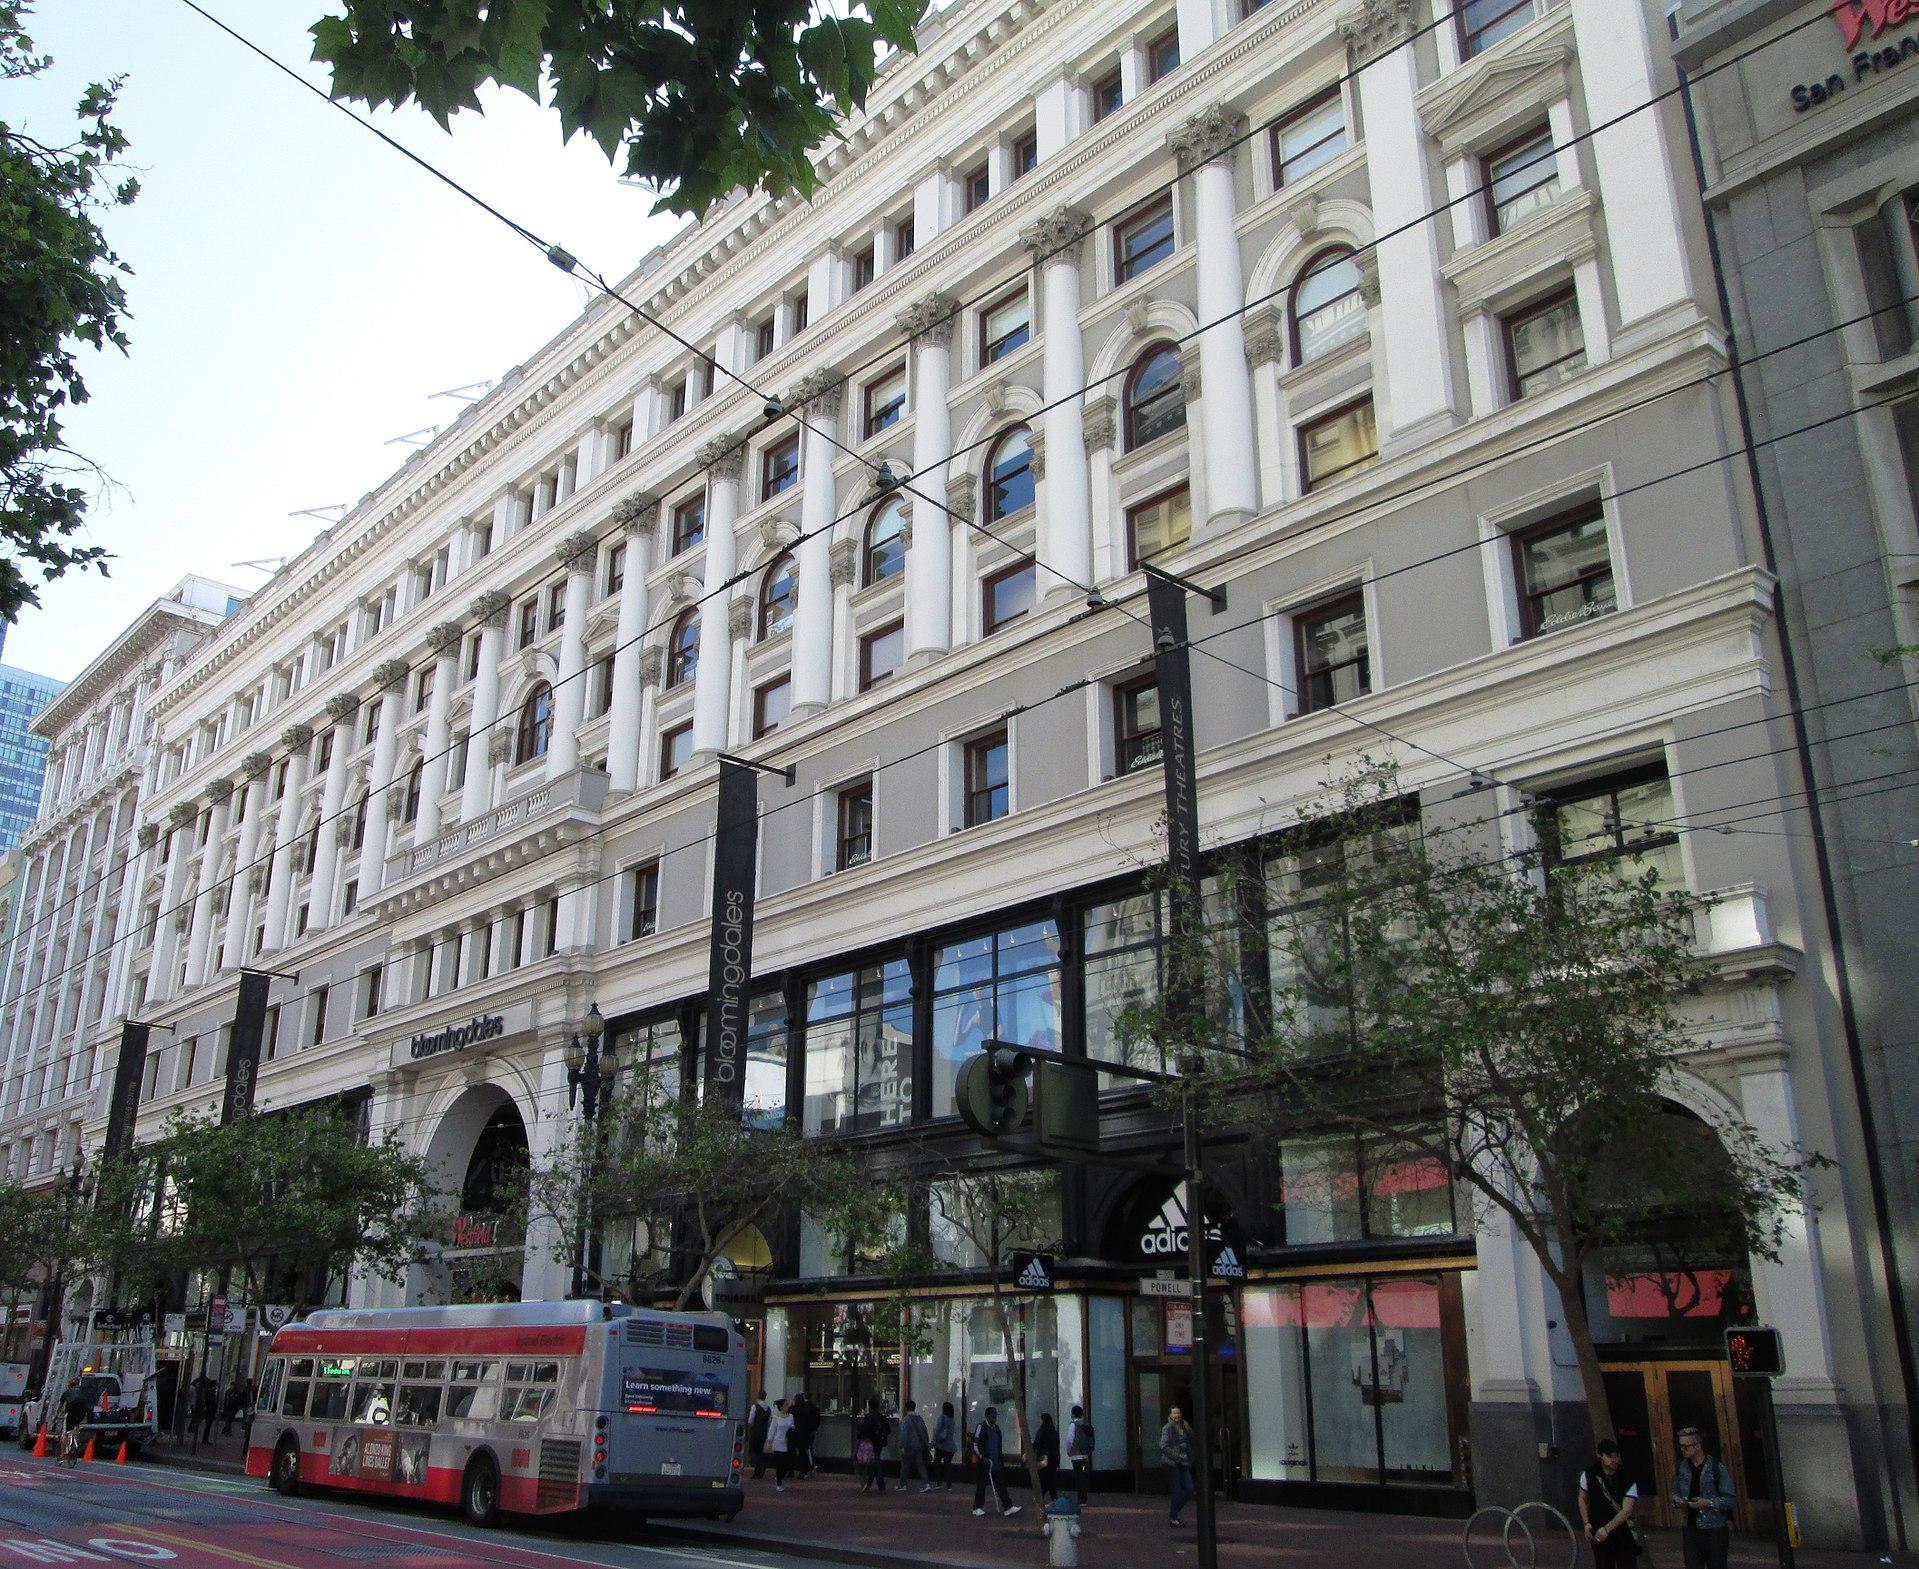 1920px-Westfield_San_Francisco_Centre_845_Market_Street.jpg